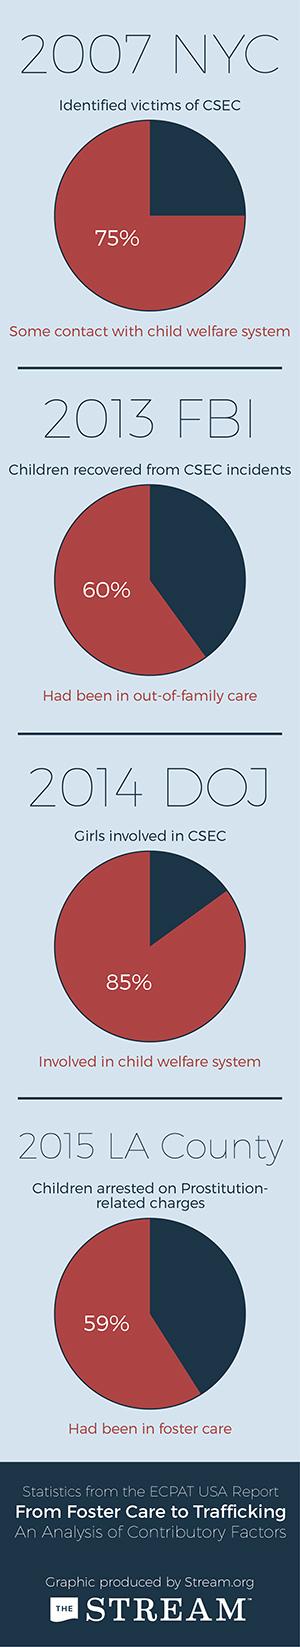 ESPAT Report CSEC Trafficking Statistics - 300